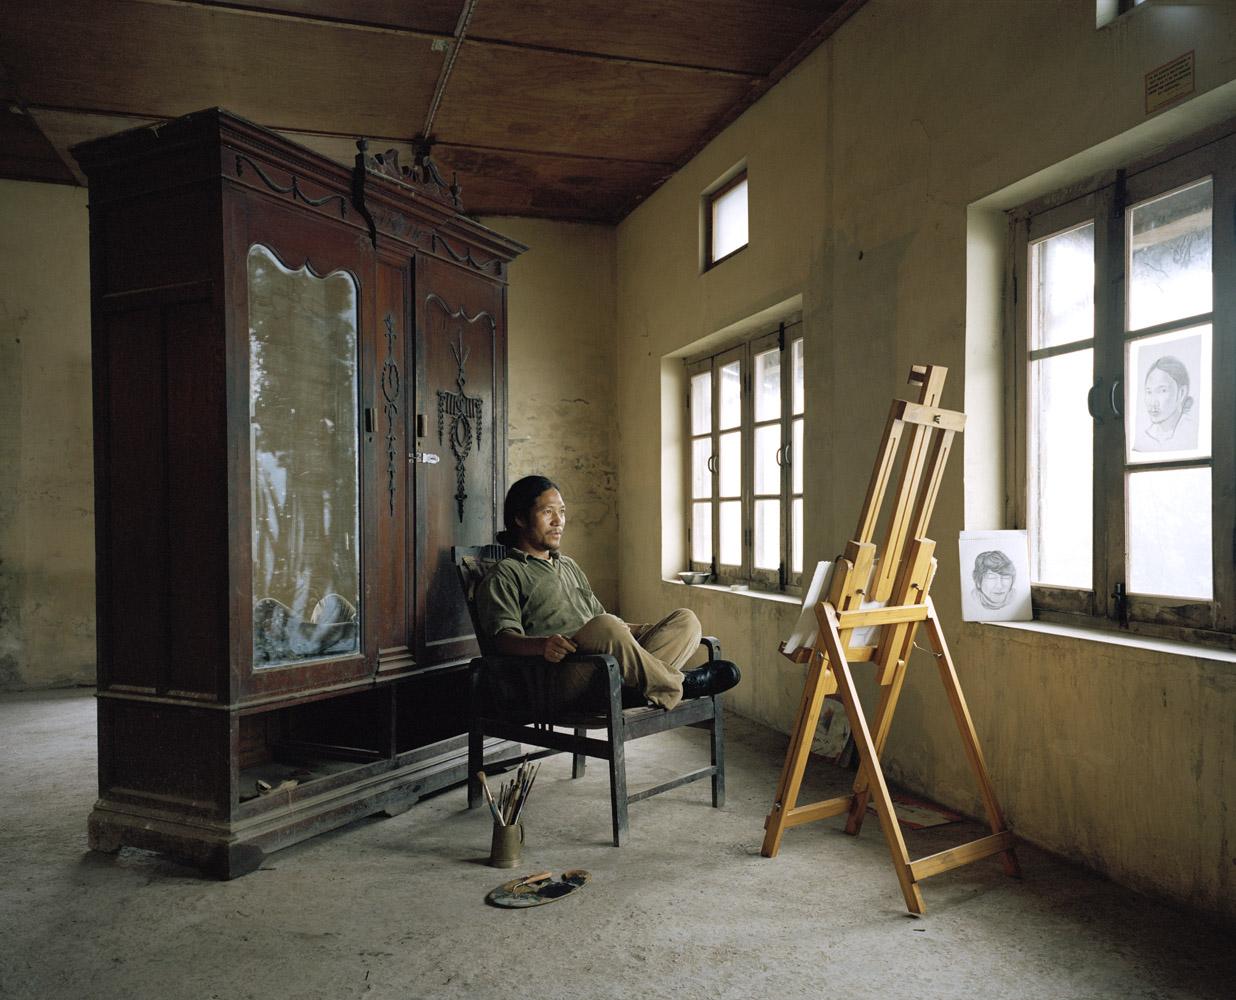 Karma Sichoc, a Tibetan Thangka artist, inside his studio in Dharamsala.